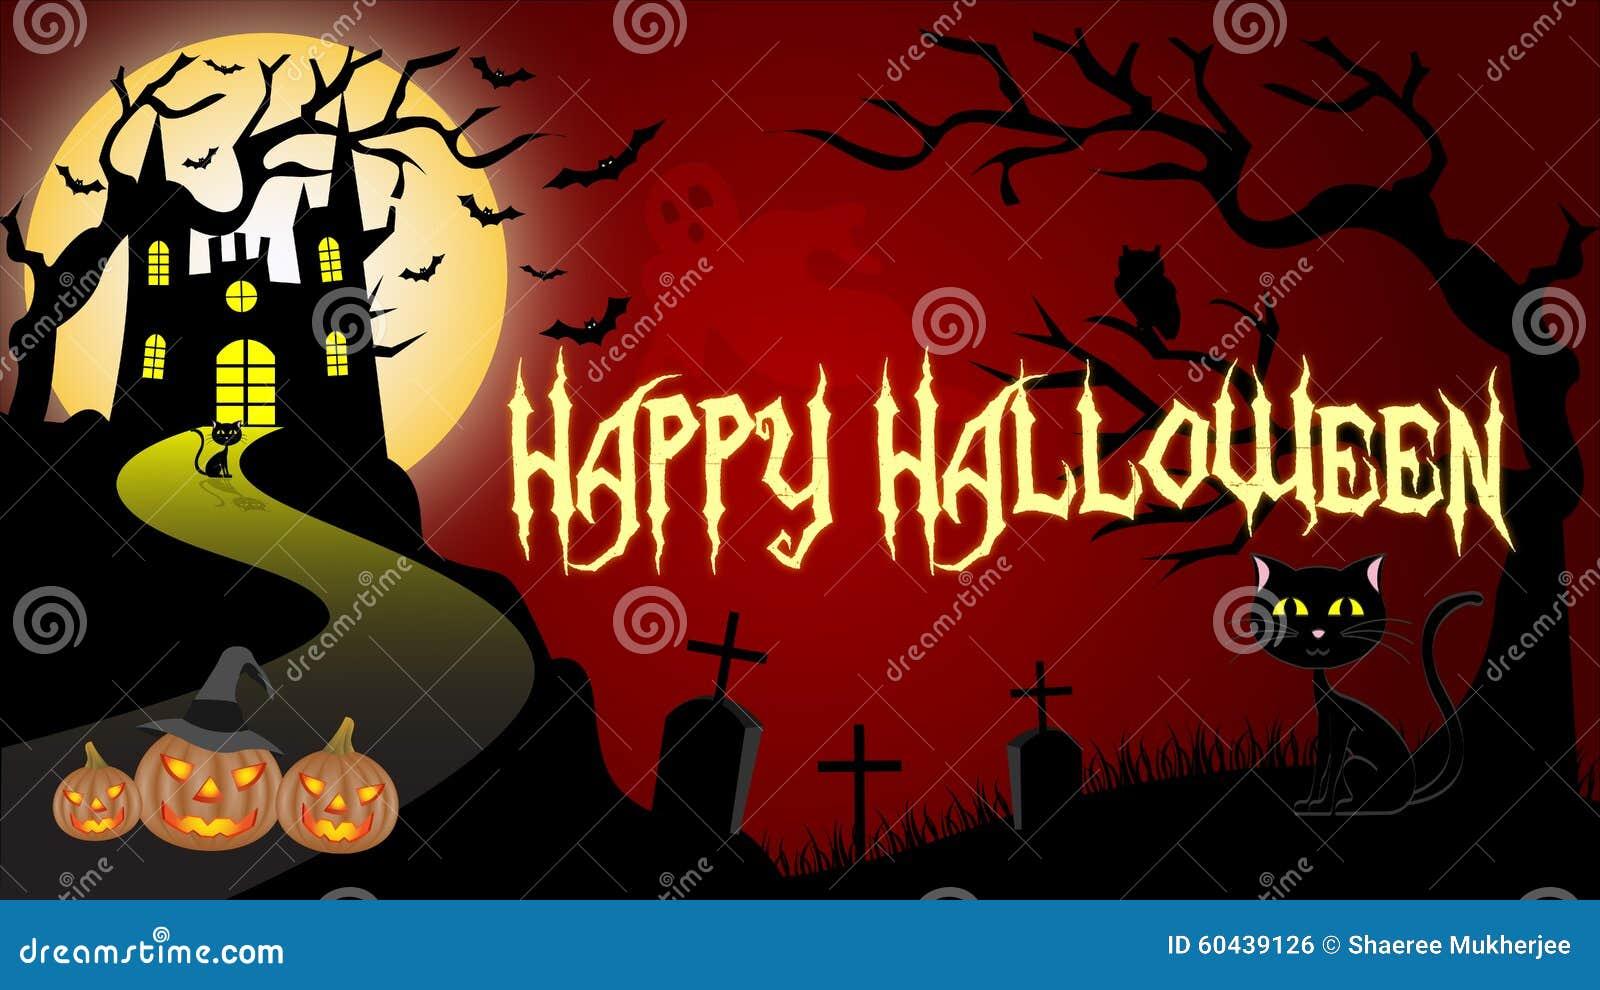 Great Wallpaper Halloween Red - halloween-wallpaper-happy-background-haunted-castle-pumpkins-black-cat-ghost-bats-full-moon-60439126  Picture_468074.jpg